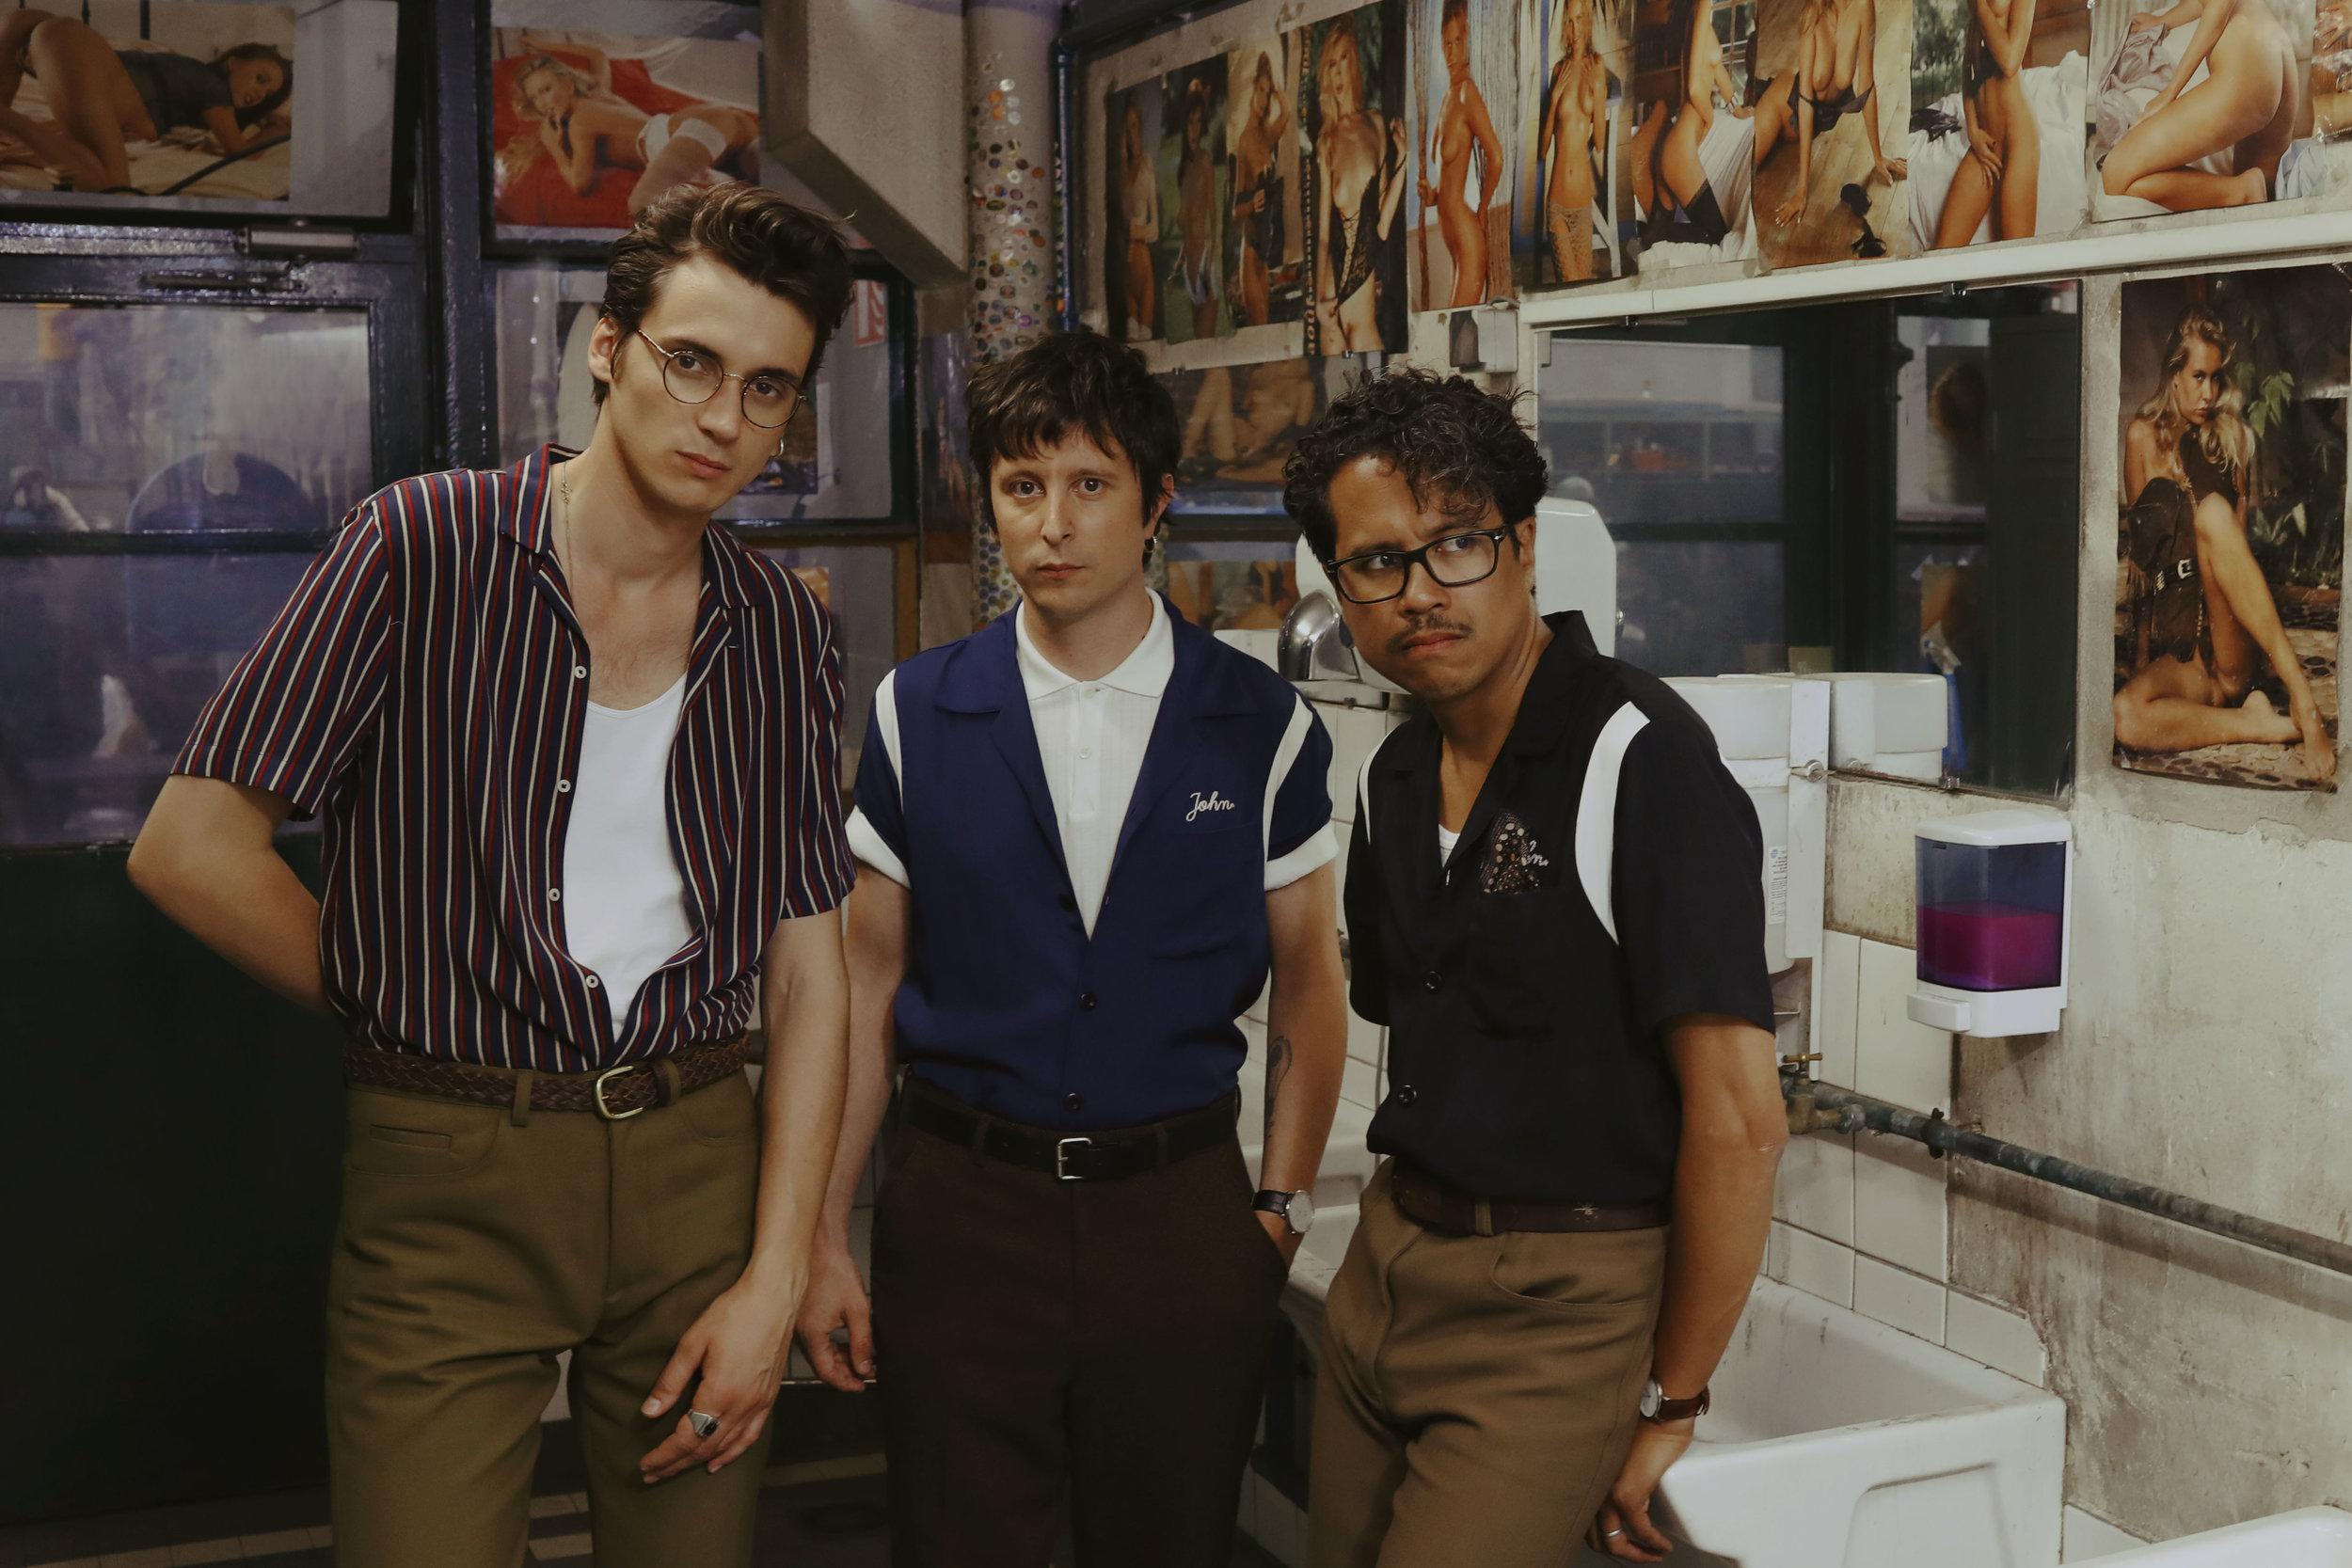 Les garçons de Radio Elvis : Pierre Guénard, Manu Ralambo et Colin Russeil. Photo Fanny LATOUR-LAMBERT